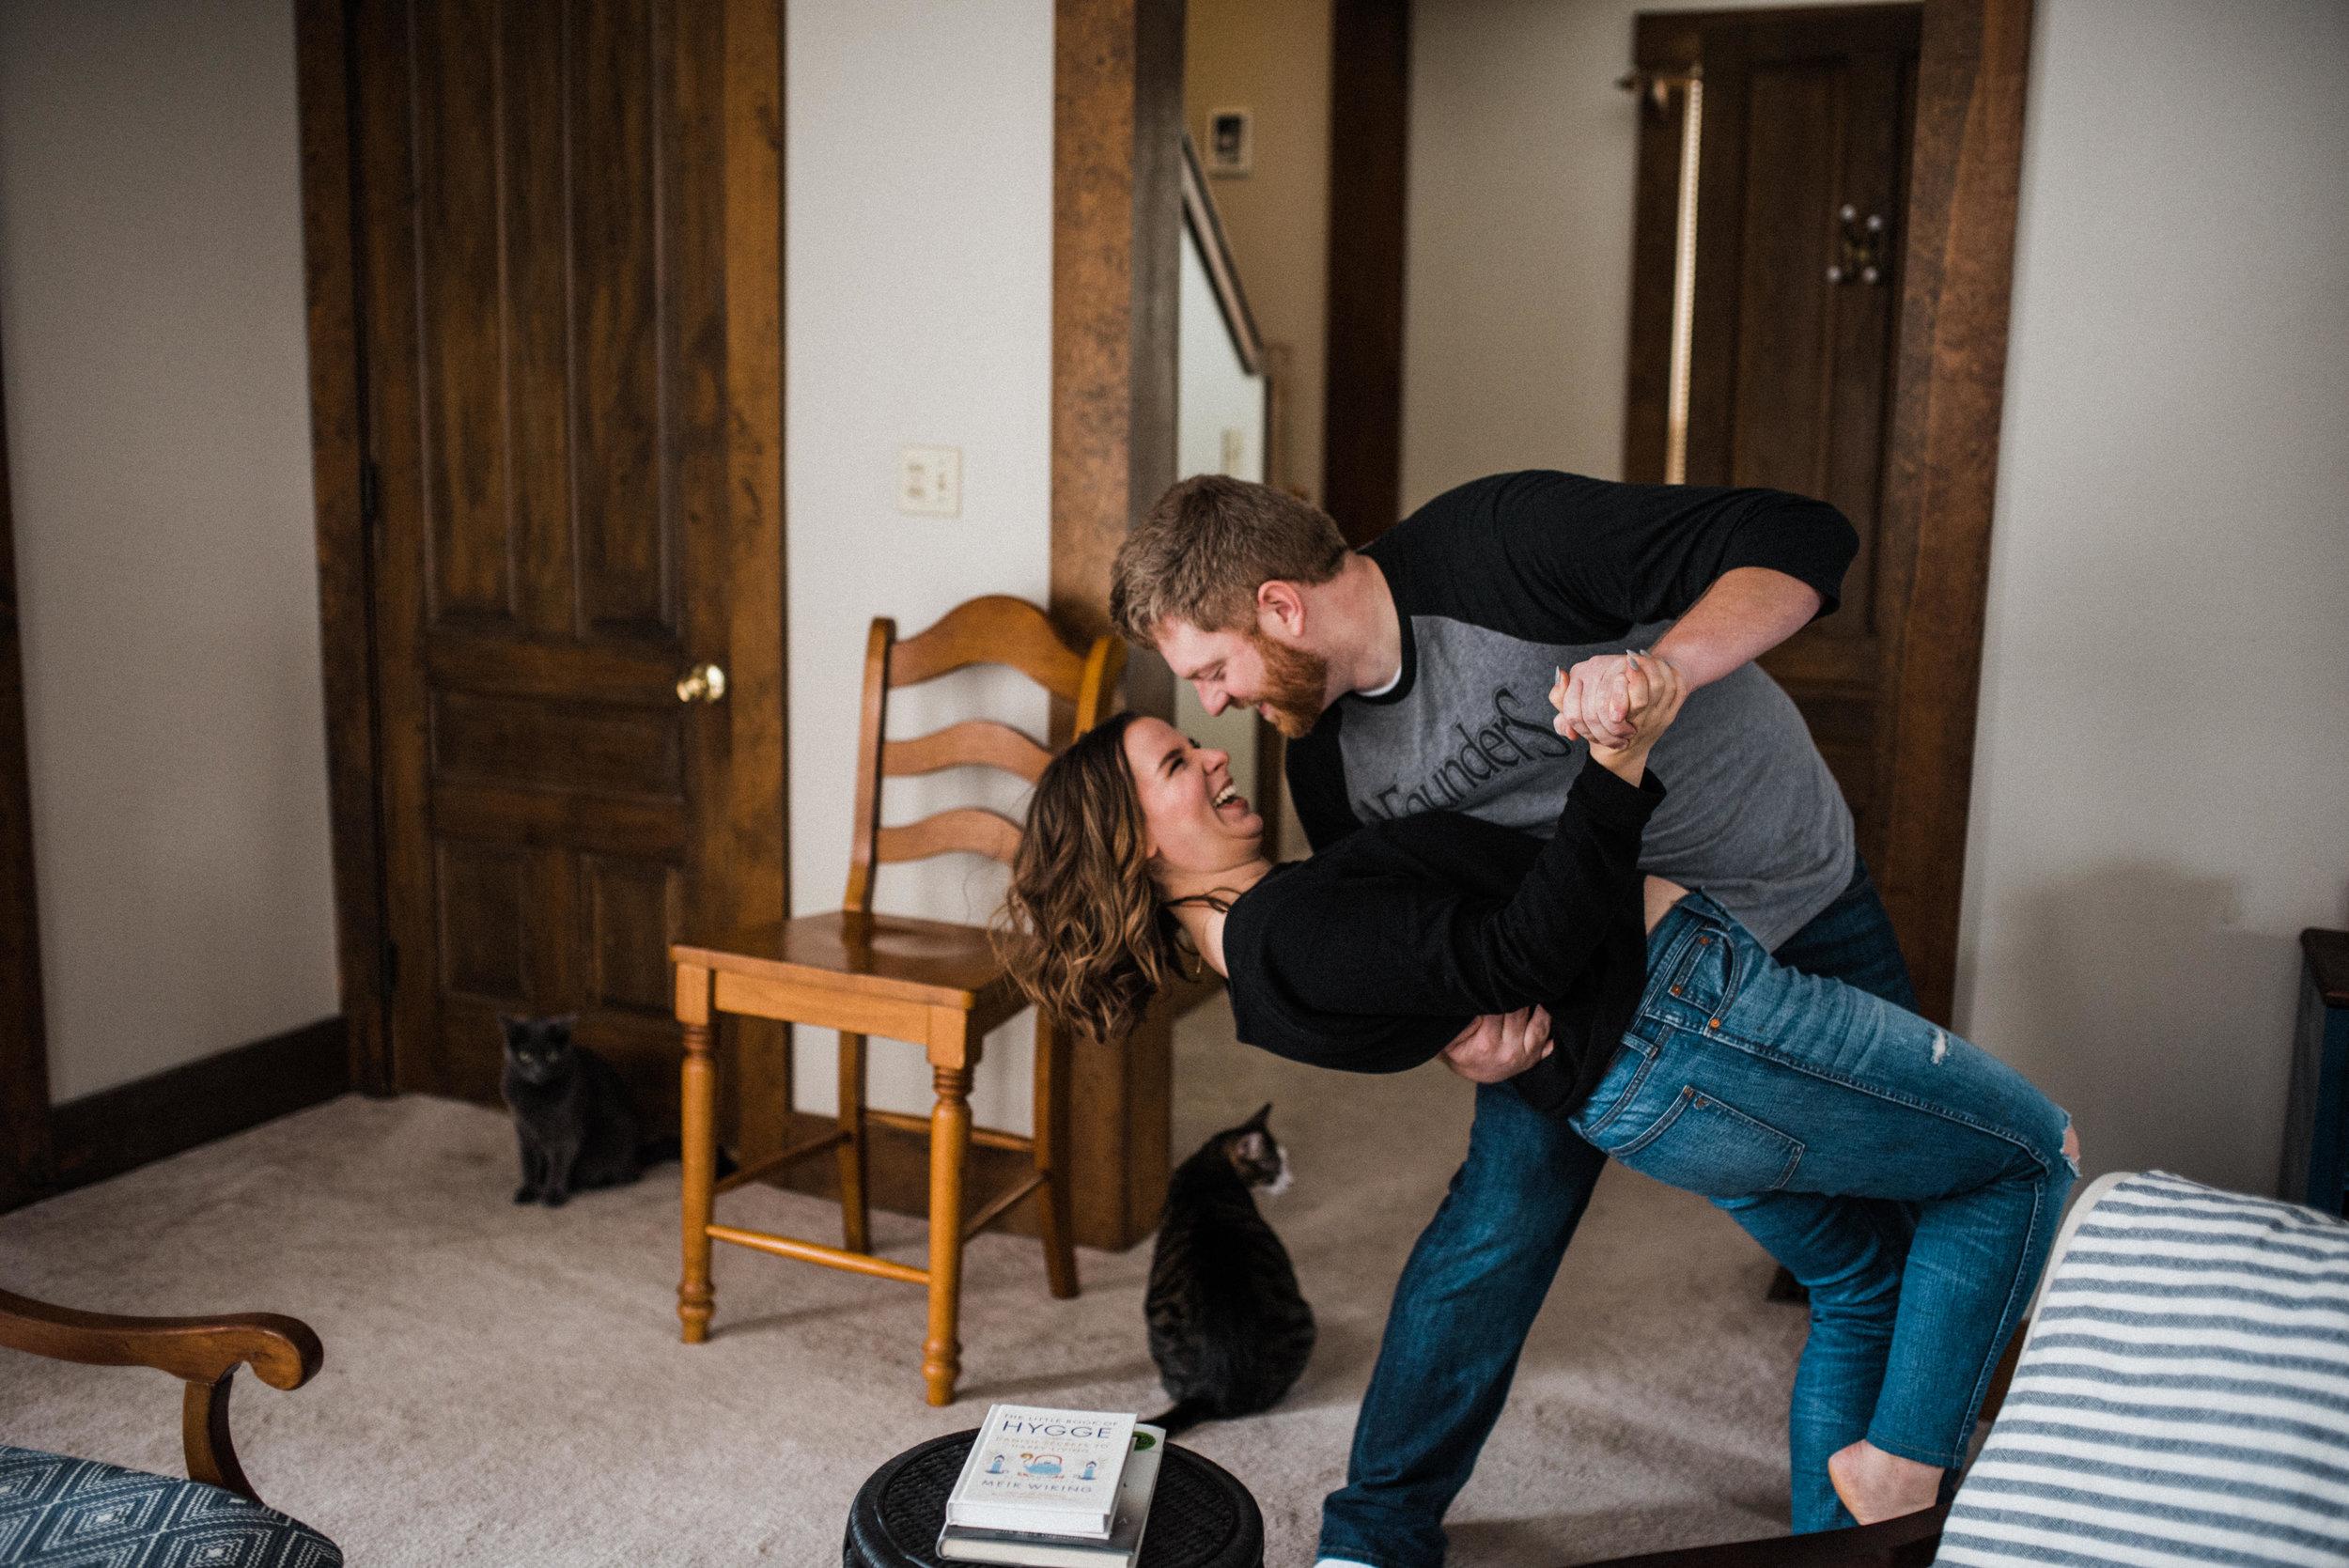 Lotte&Chad-Chelsea-Hall-Photography-Dayton-OH-58-samantha-joy-events